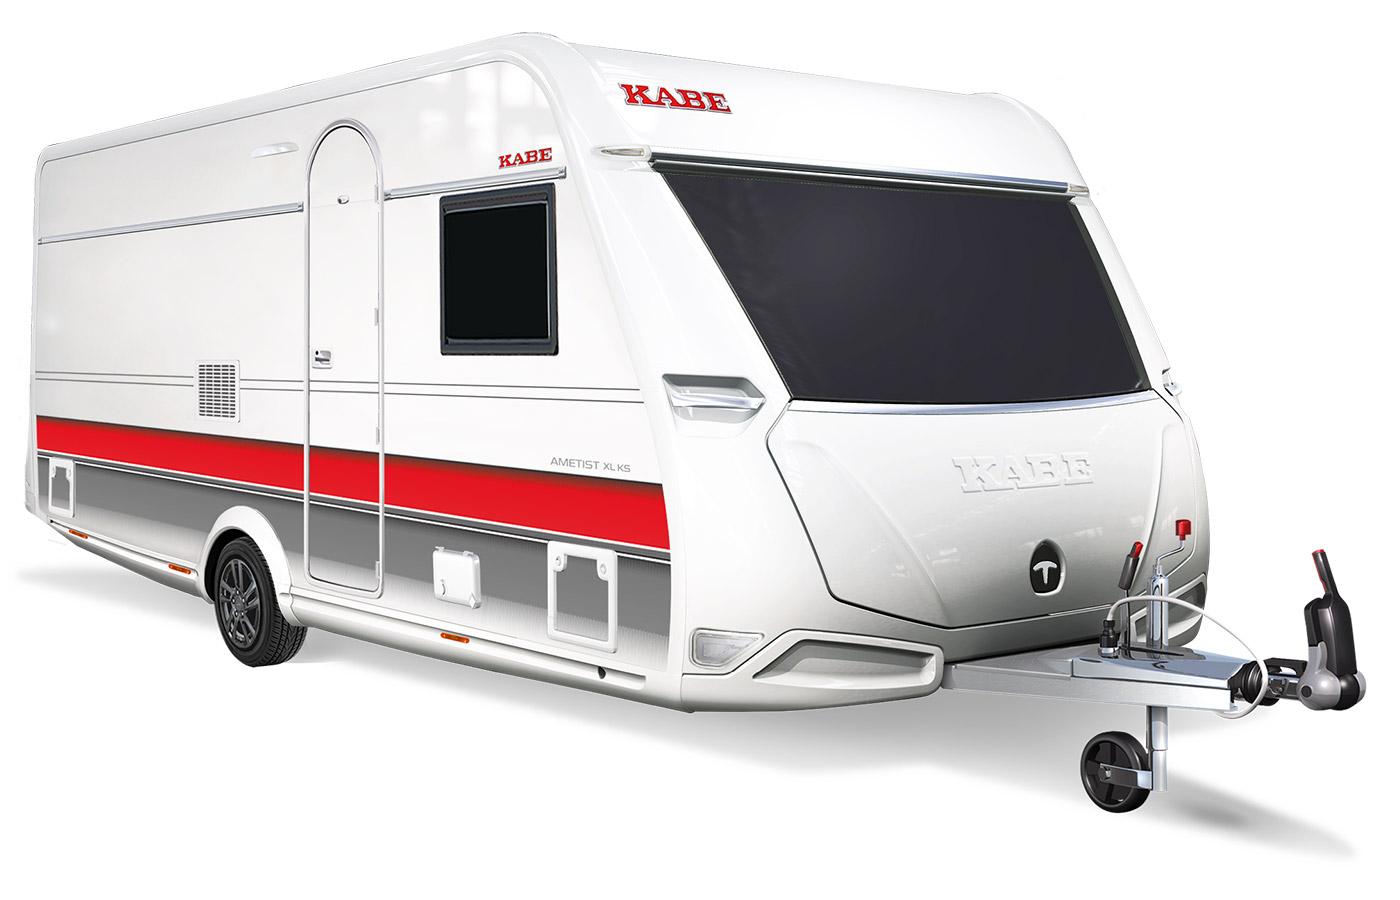 Kabe - Ametist 560 XL